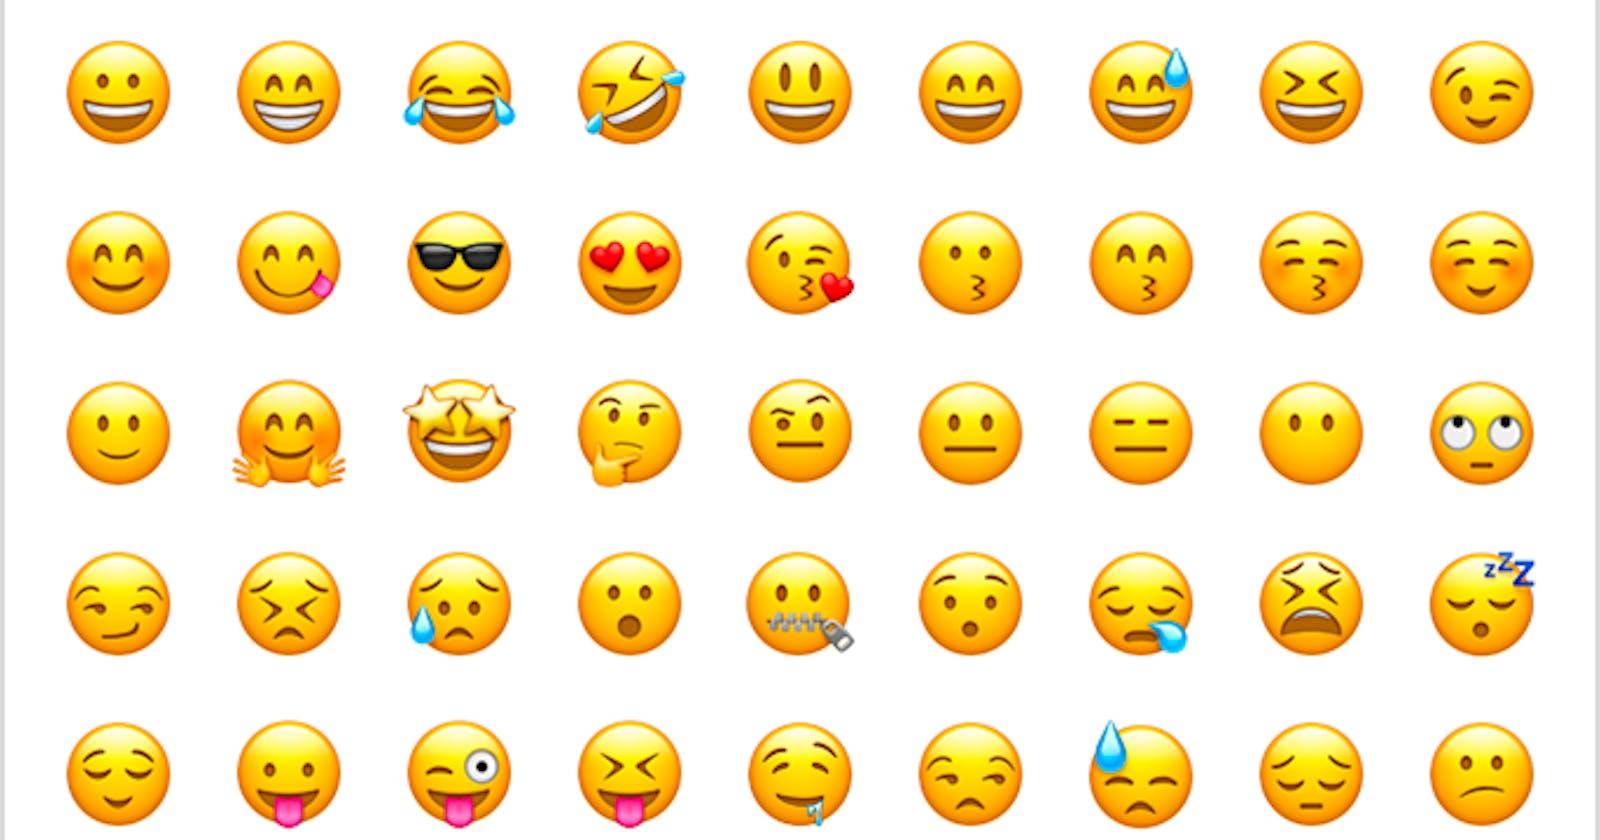 How to add an emoji picker to an input field in react app